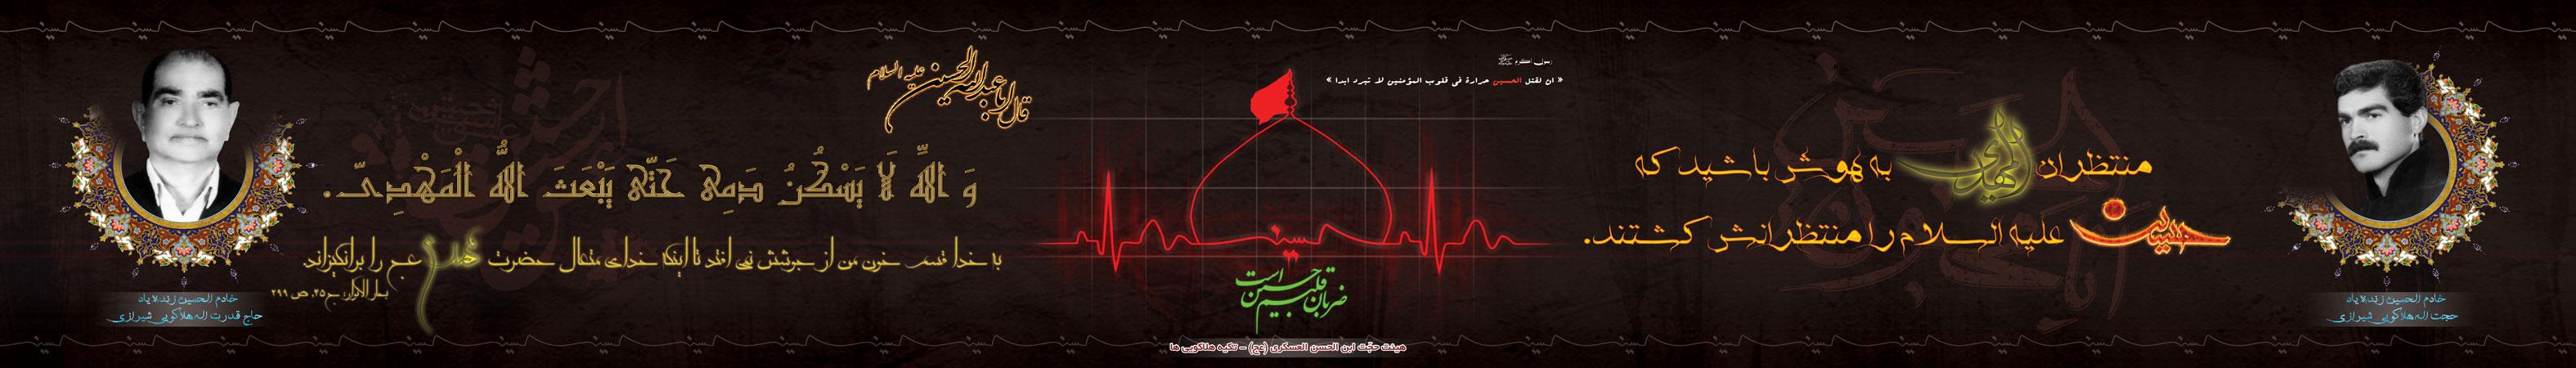 halakouee-banner